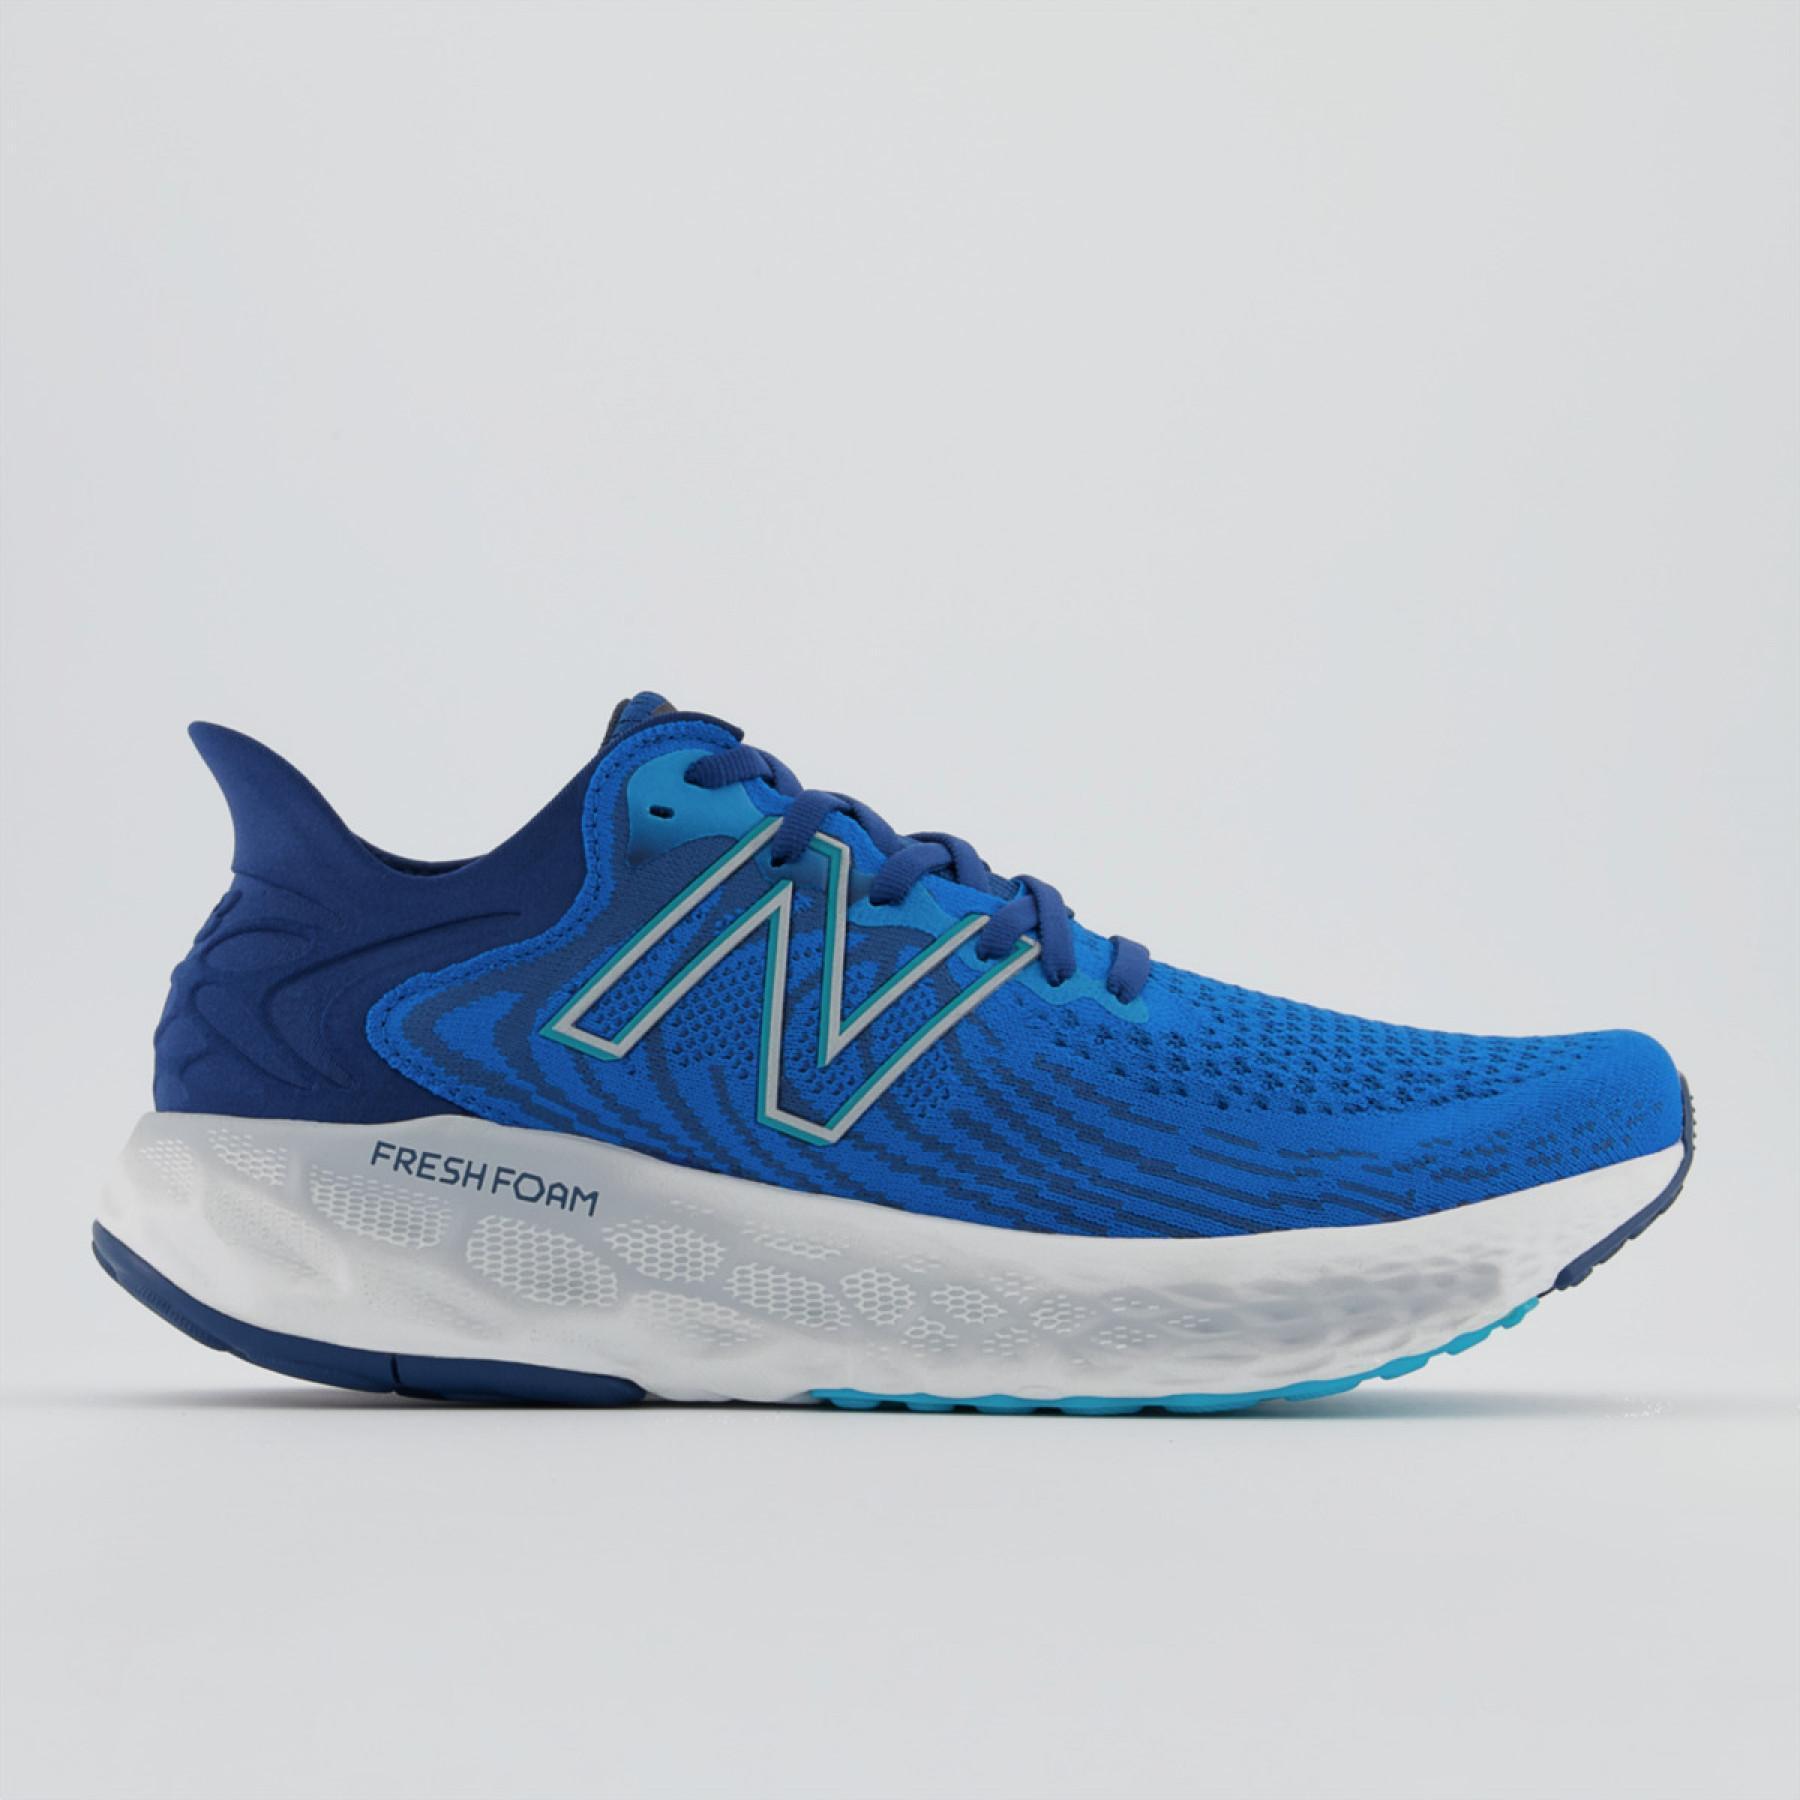 Chaussures New Balance fresh foam 1080v11